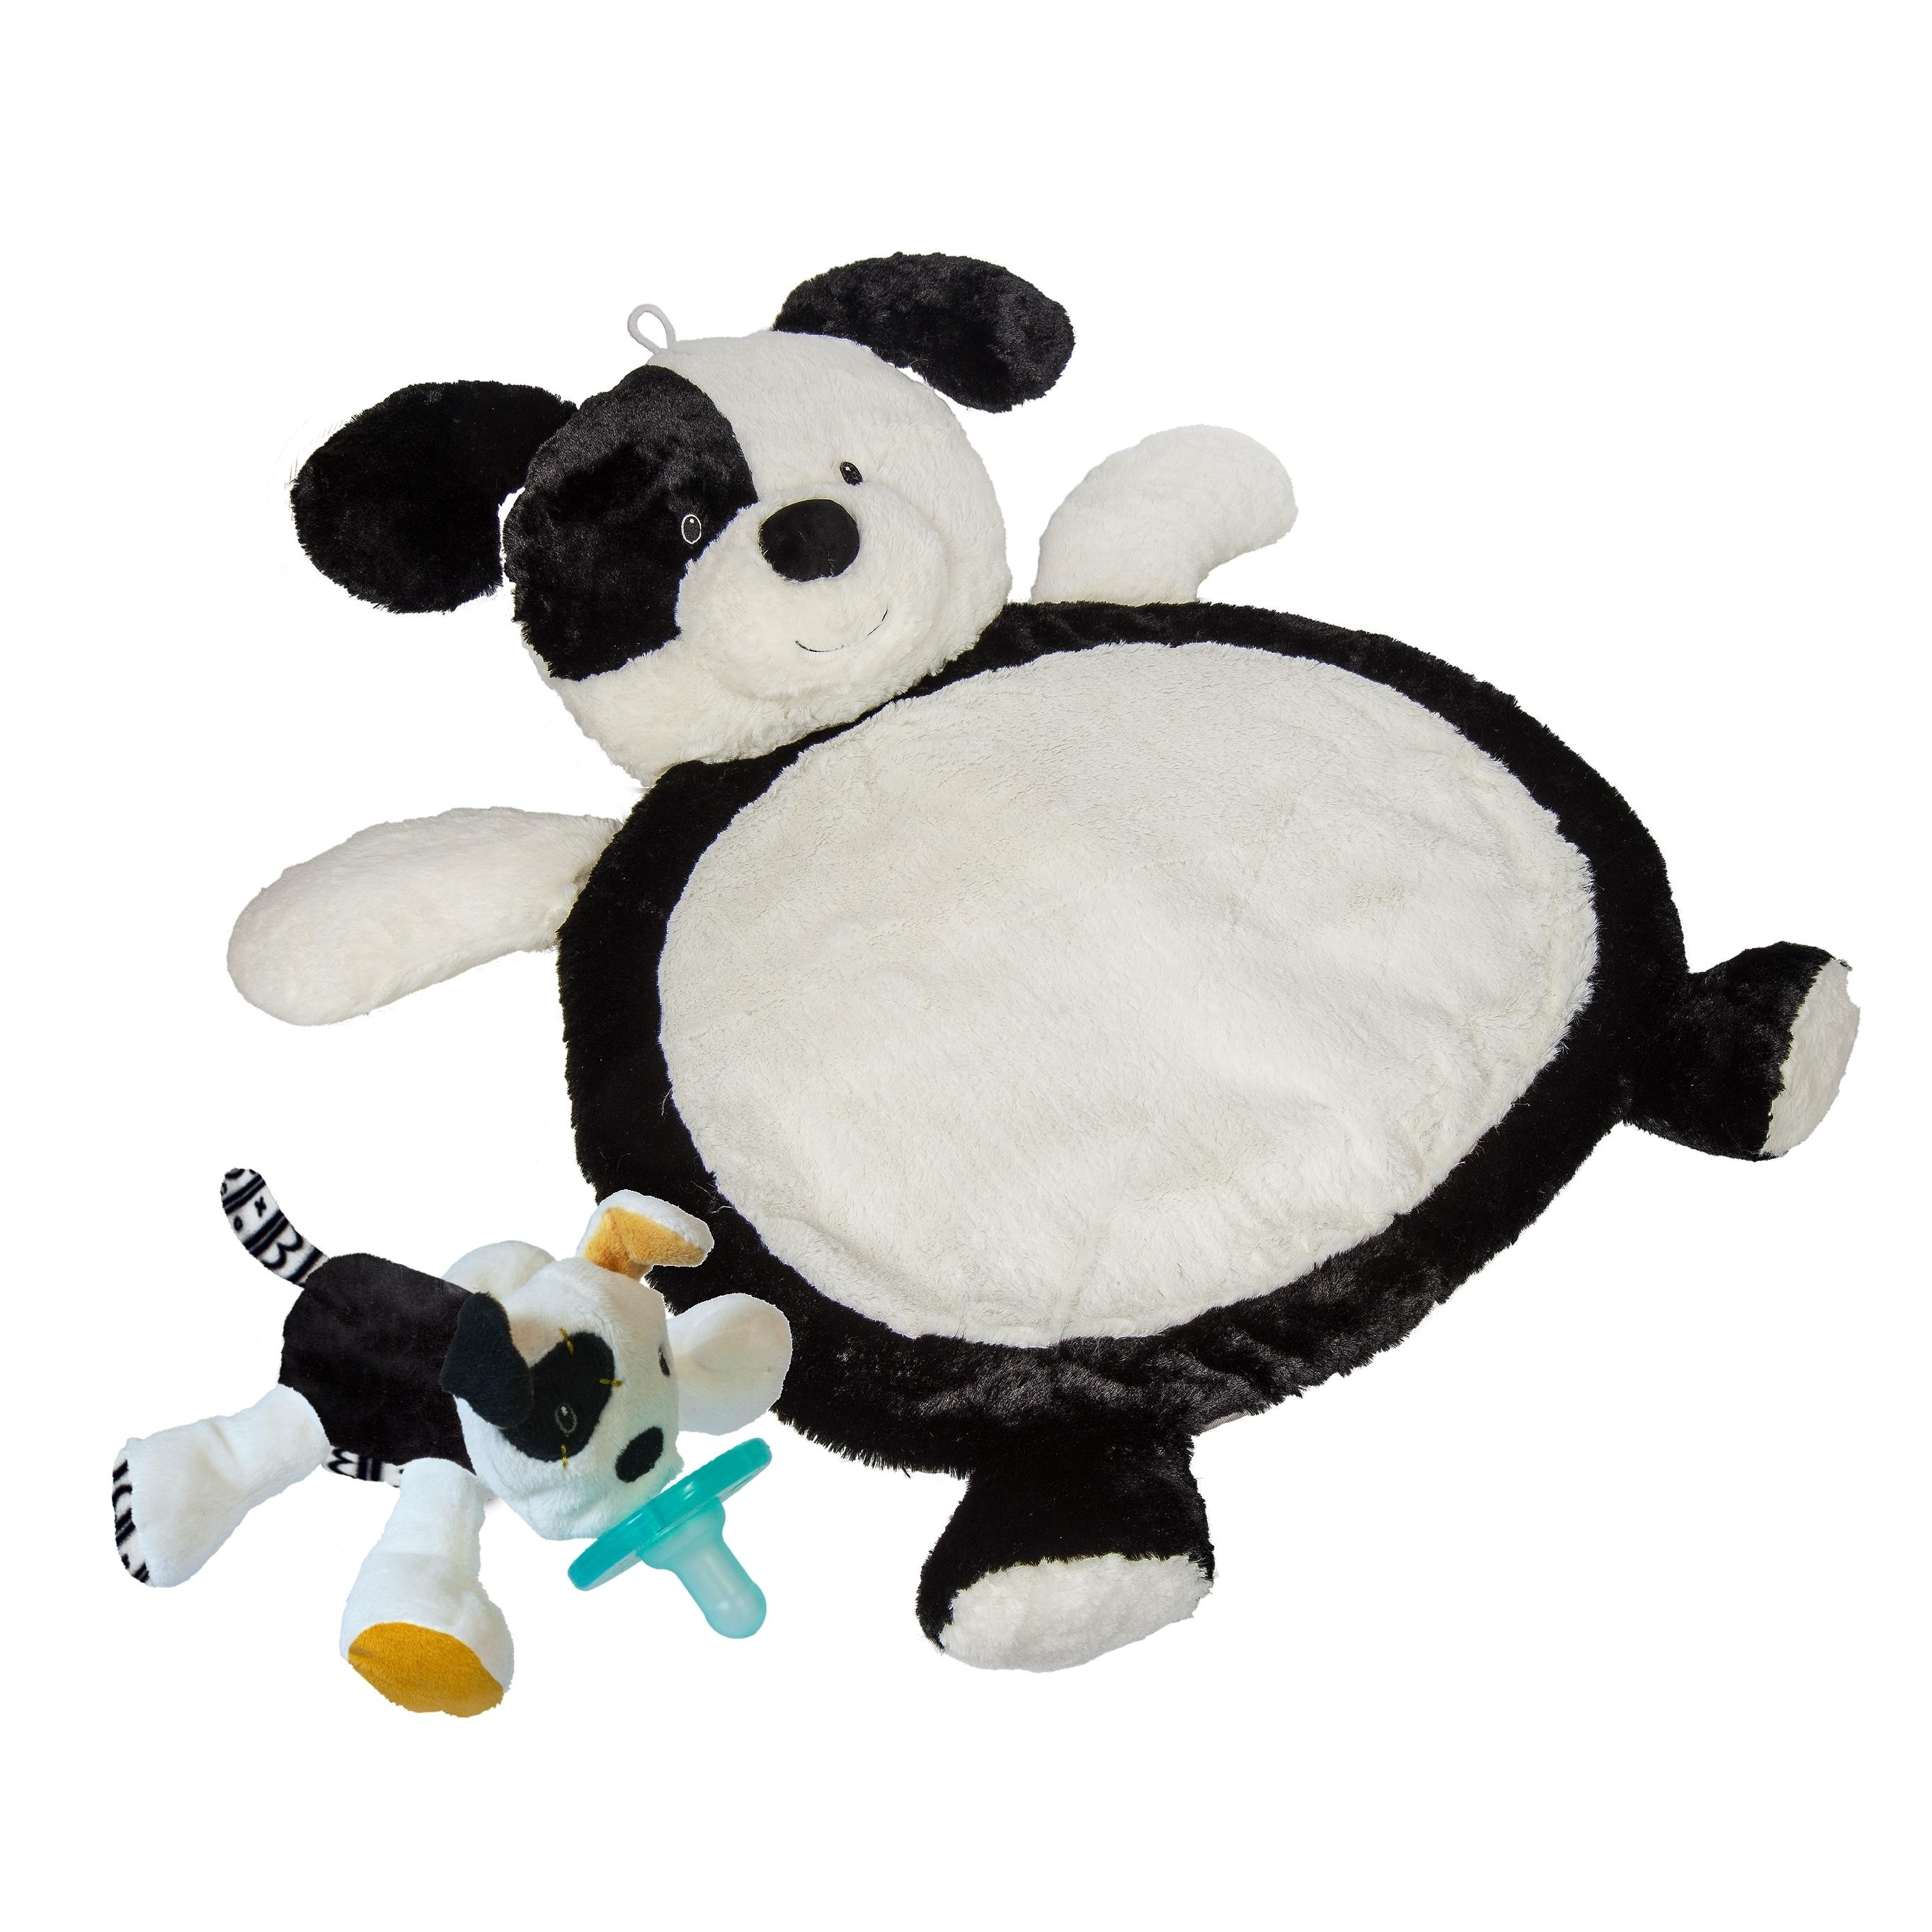 Mary Meyer Baby Mat - Black & White Puppy with WubbaNub T...